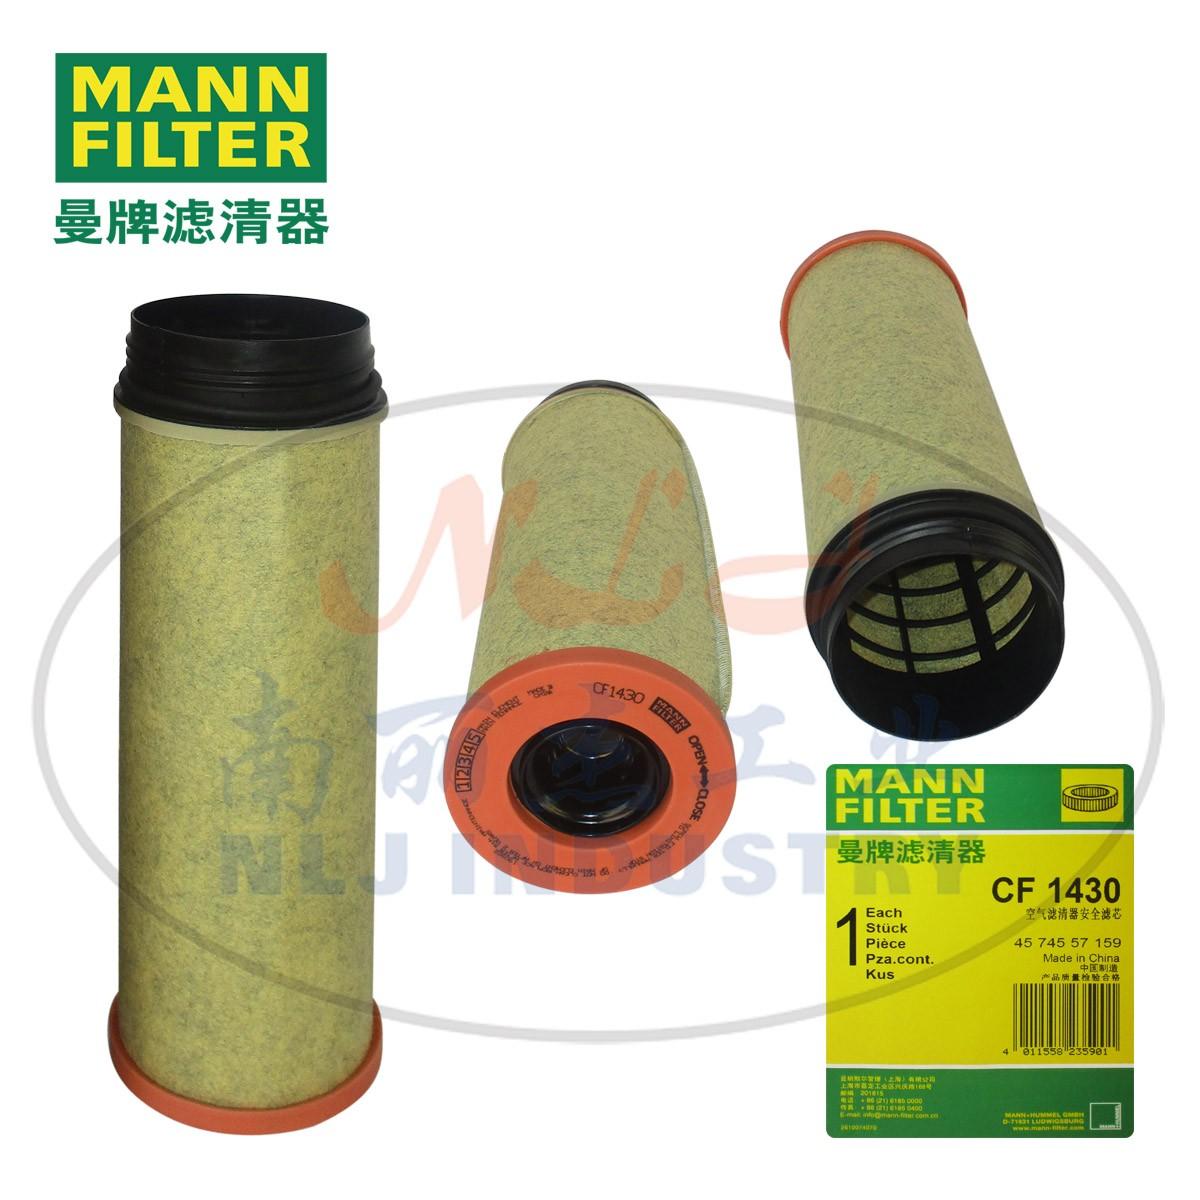 CF1430 MANNFILTER曼牌滤清器空气滤芯、空气滤清器